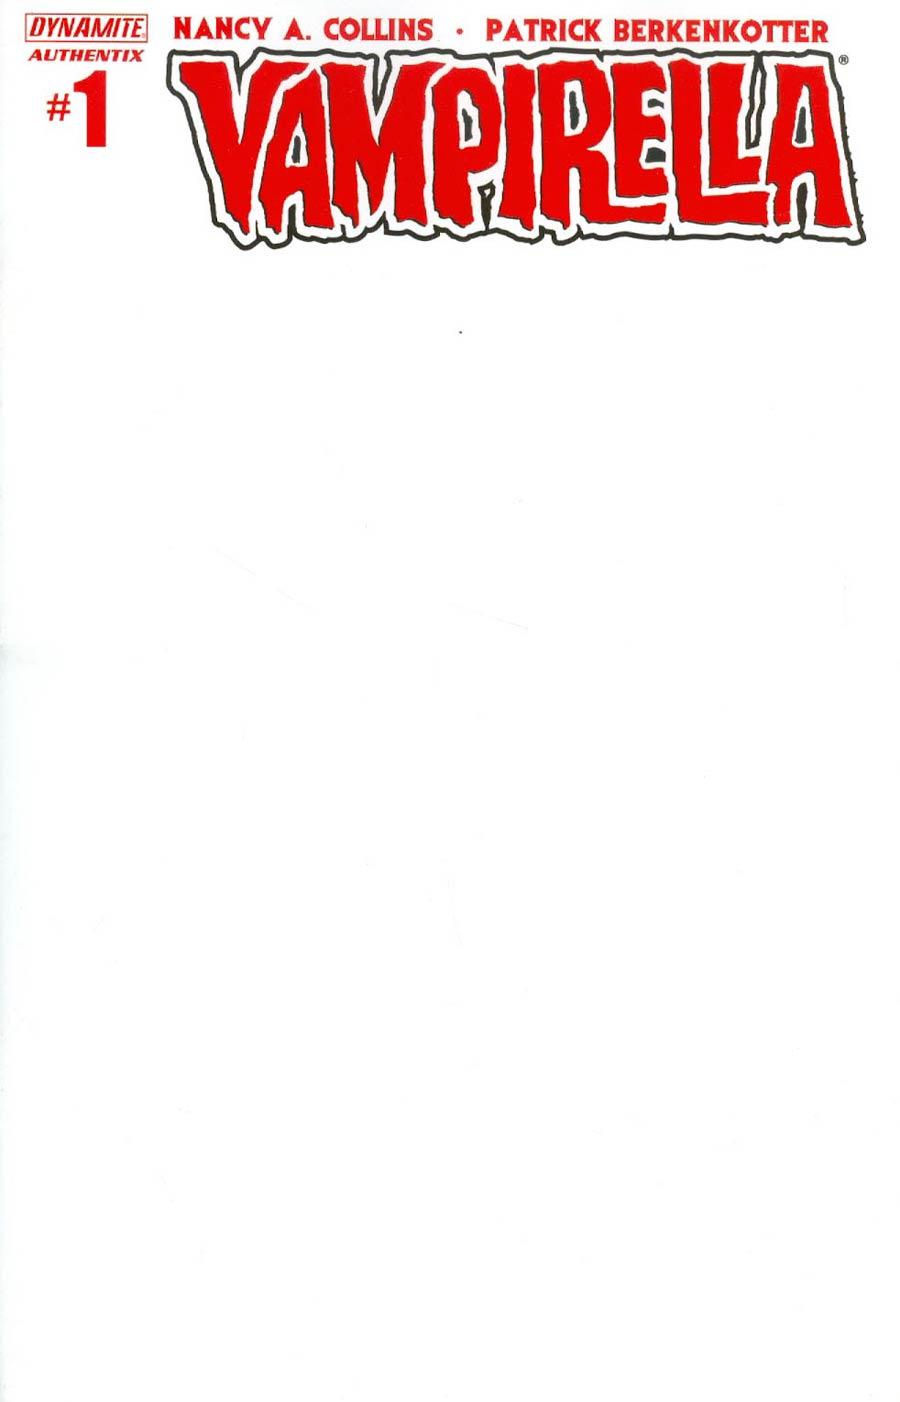 Vampirella Vol 5 #1 Cover F Variant Blank Authentix Cover